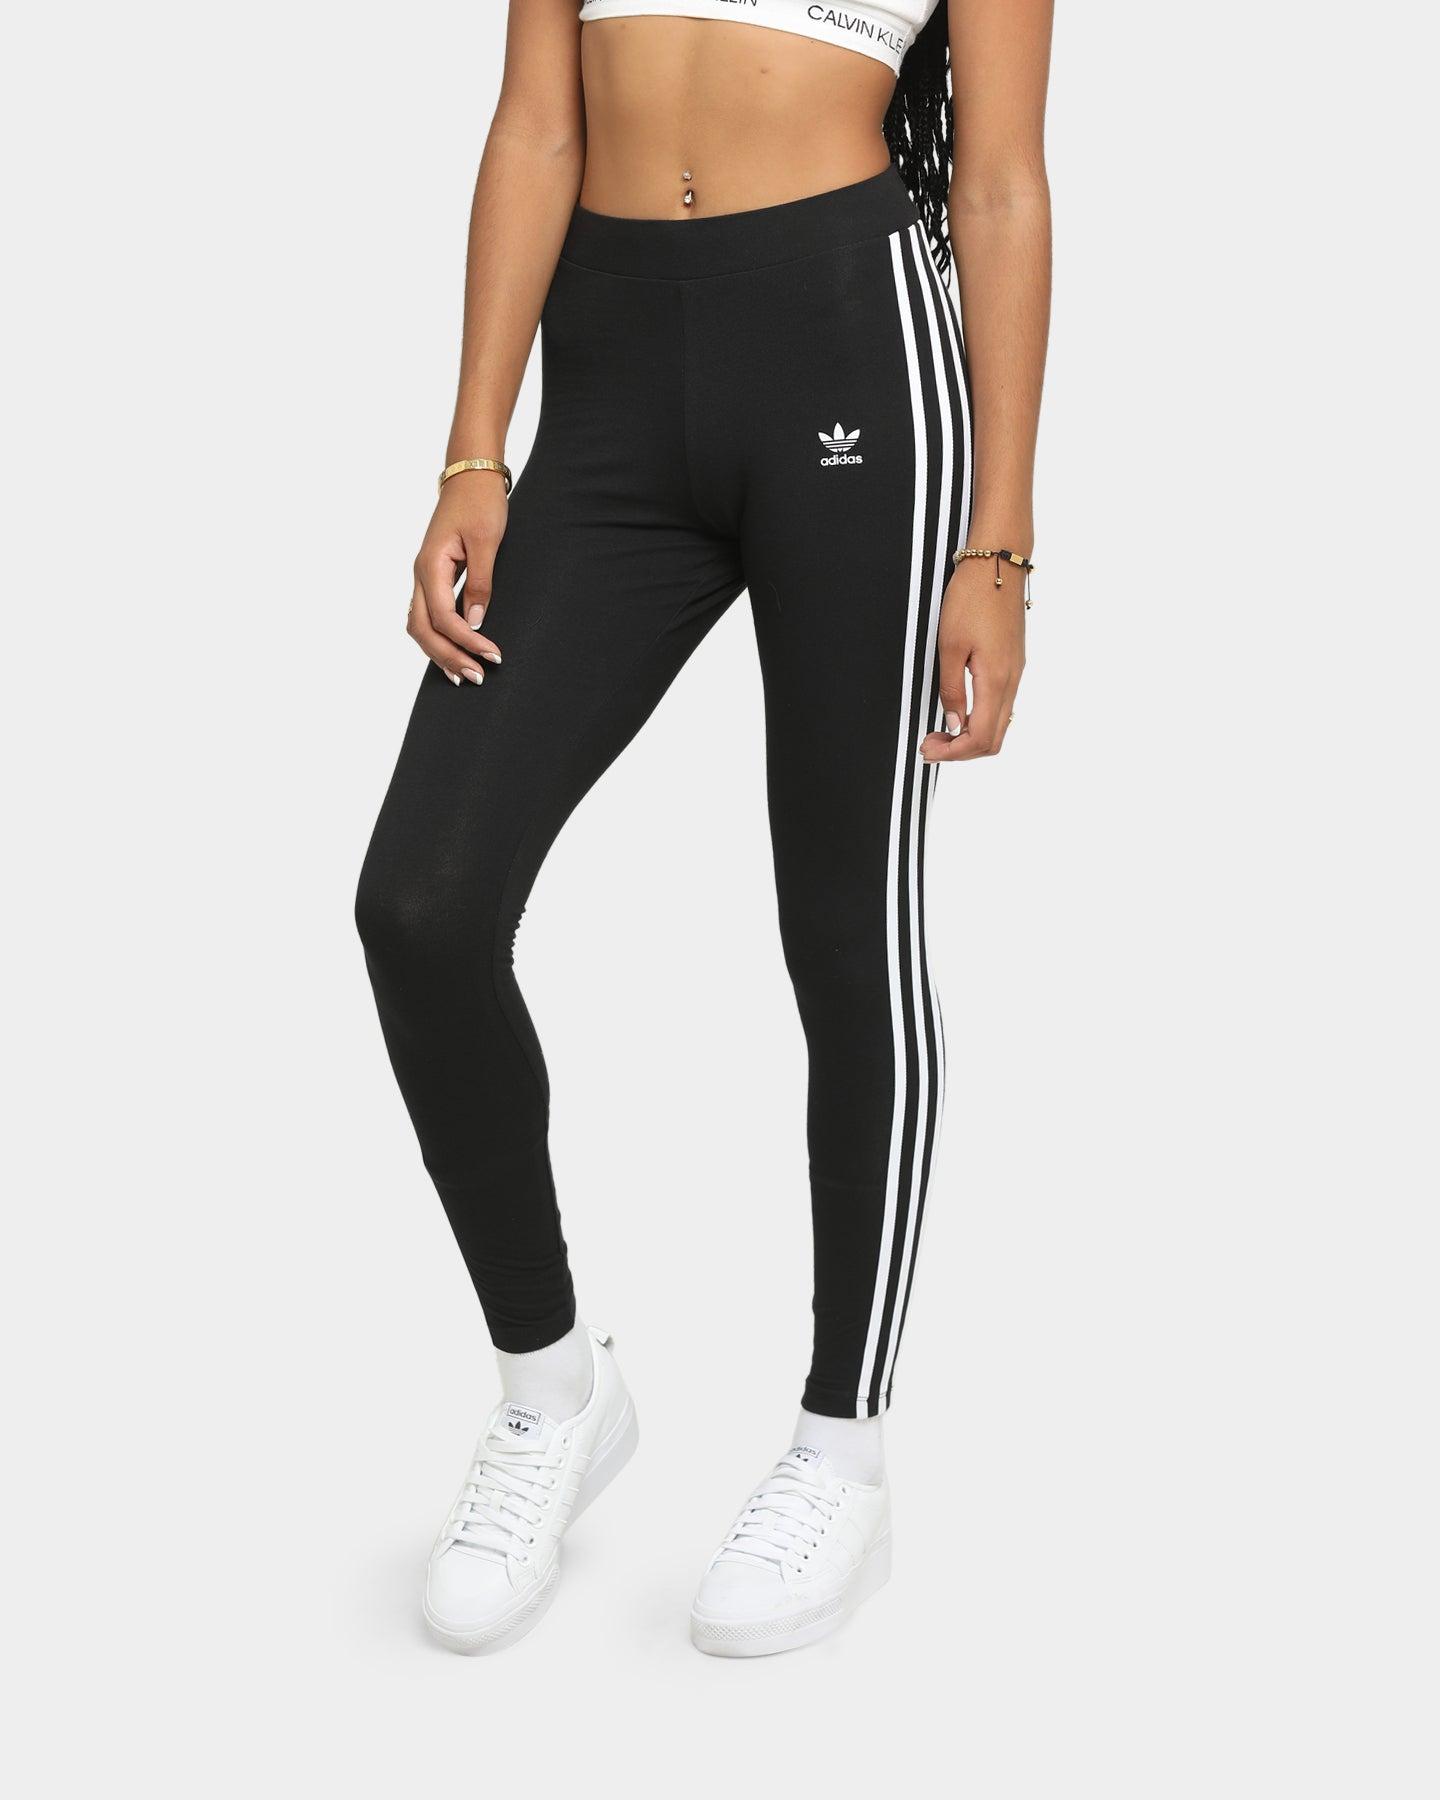 Adidas 3 Stripe Tight Black | Culture